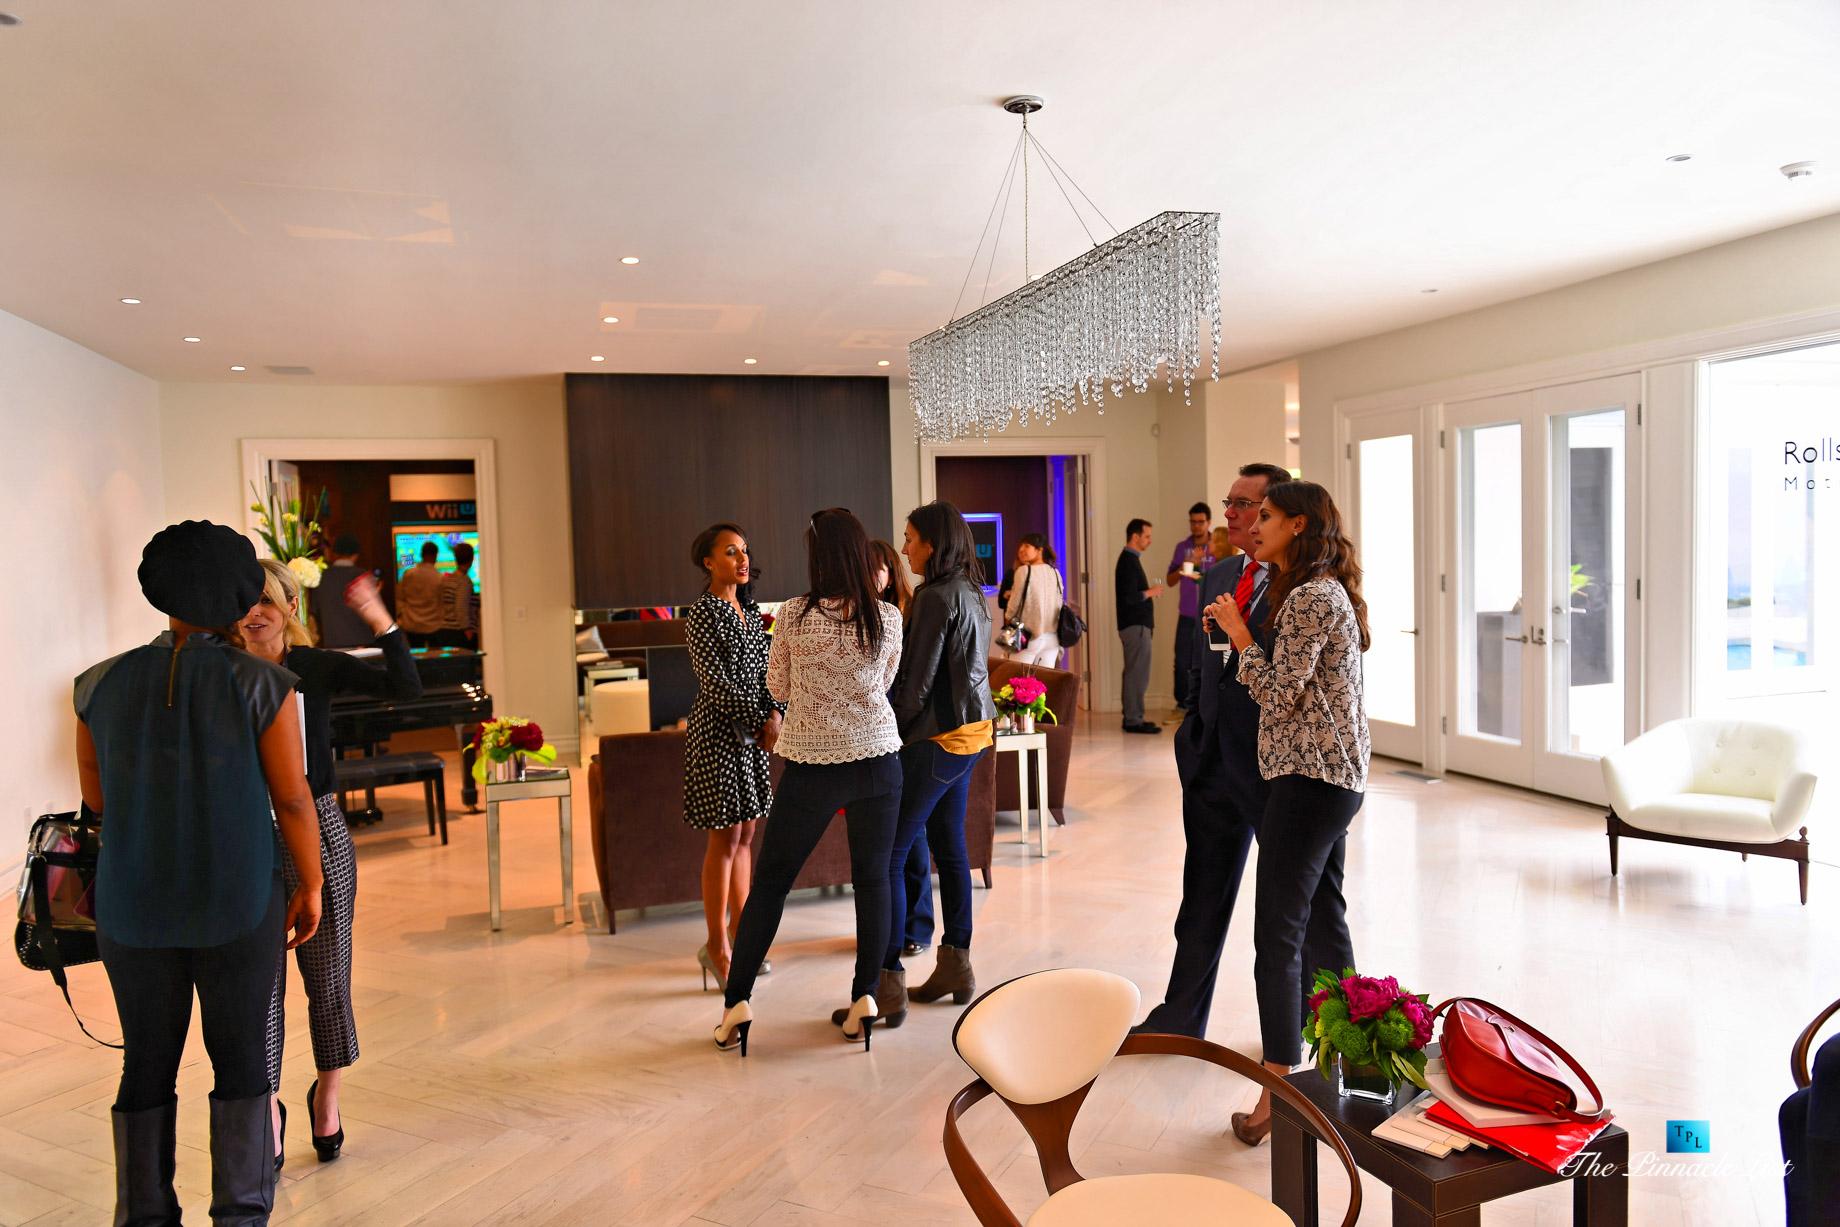 Kerry Washington – Rolls-Royce Hosts The Variety Studio Event in Beverly Hills, California